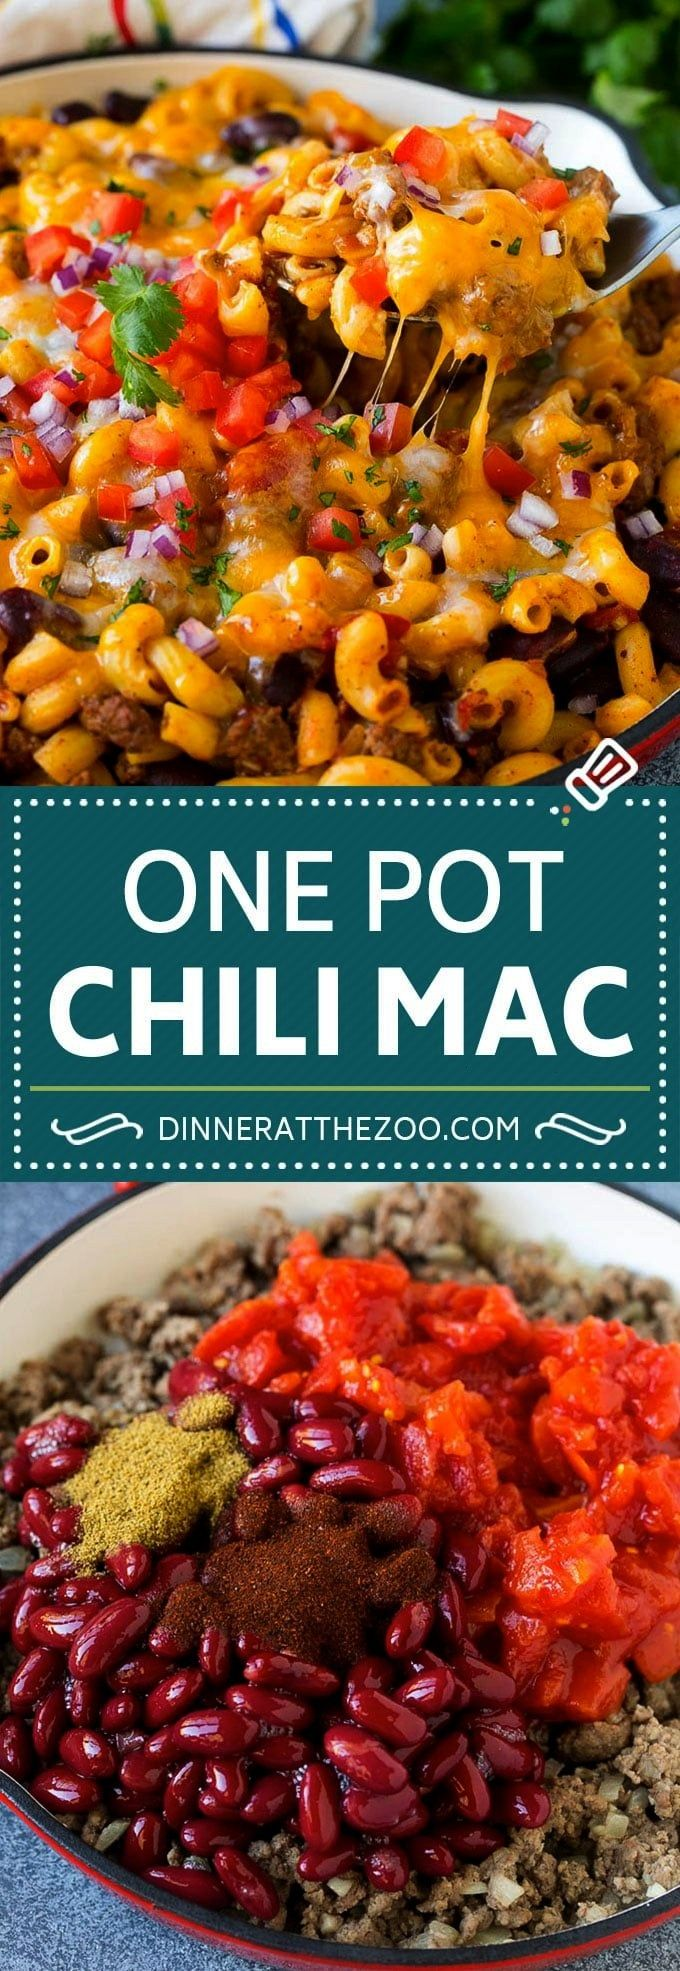 Pot Chili Mac Recipe | One Pot Pasta | Chili MacOne Pot Chili Mac Recipe | One Pot Pasta | Chili Ma